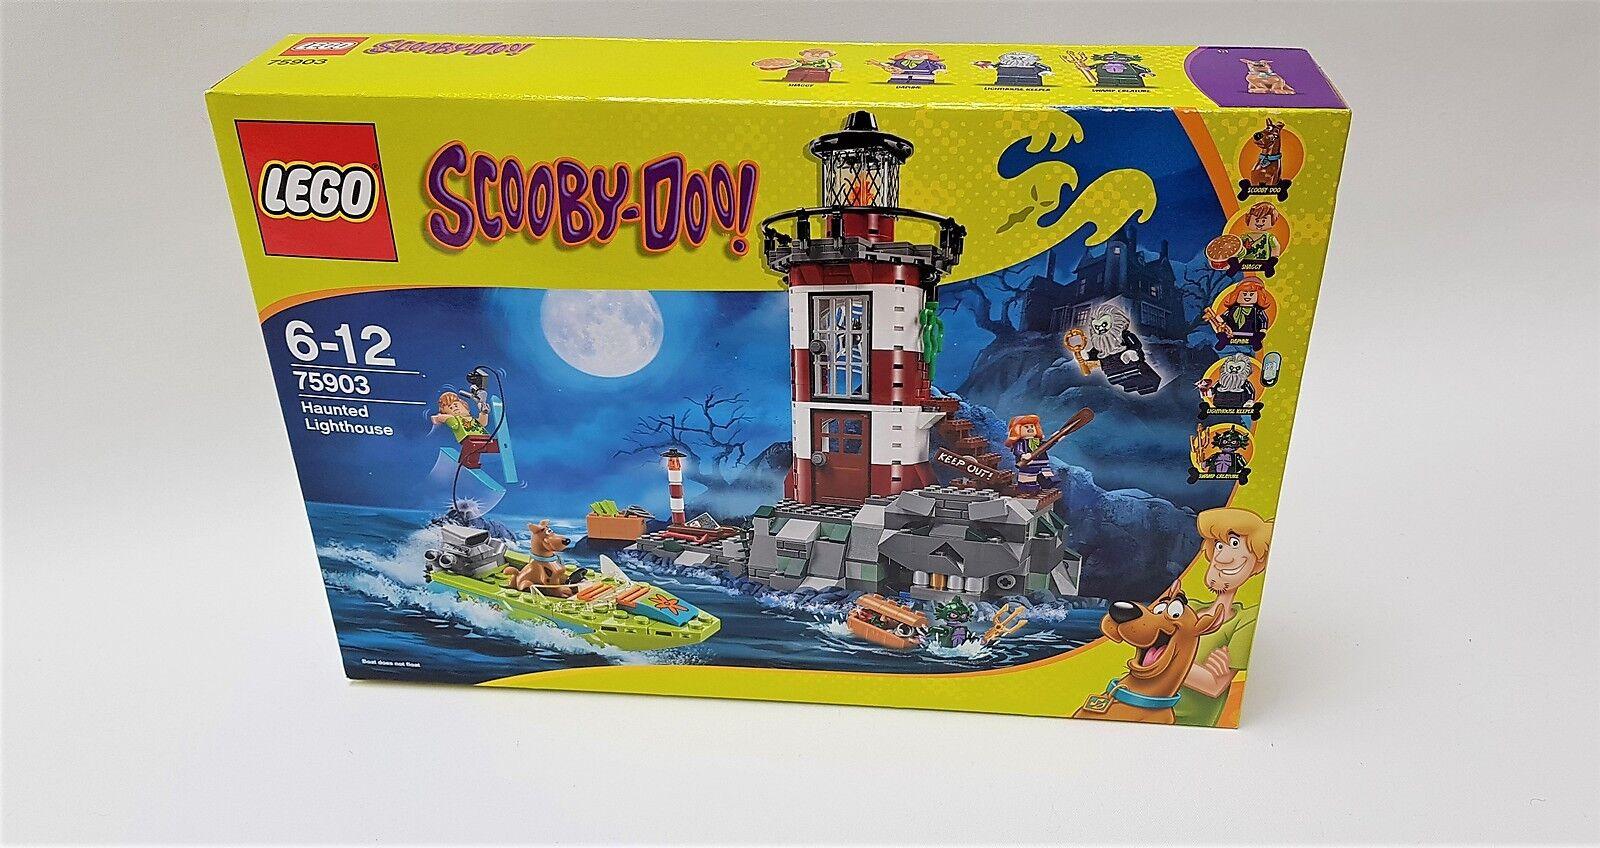 Lego Scooby Doo - The Haunted Lighthouse (75903) - New & Sealed - 2015